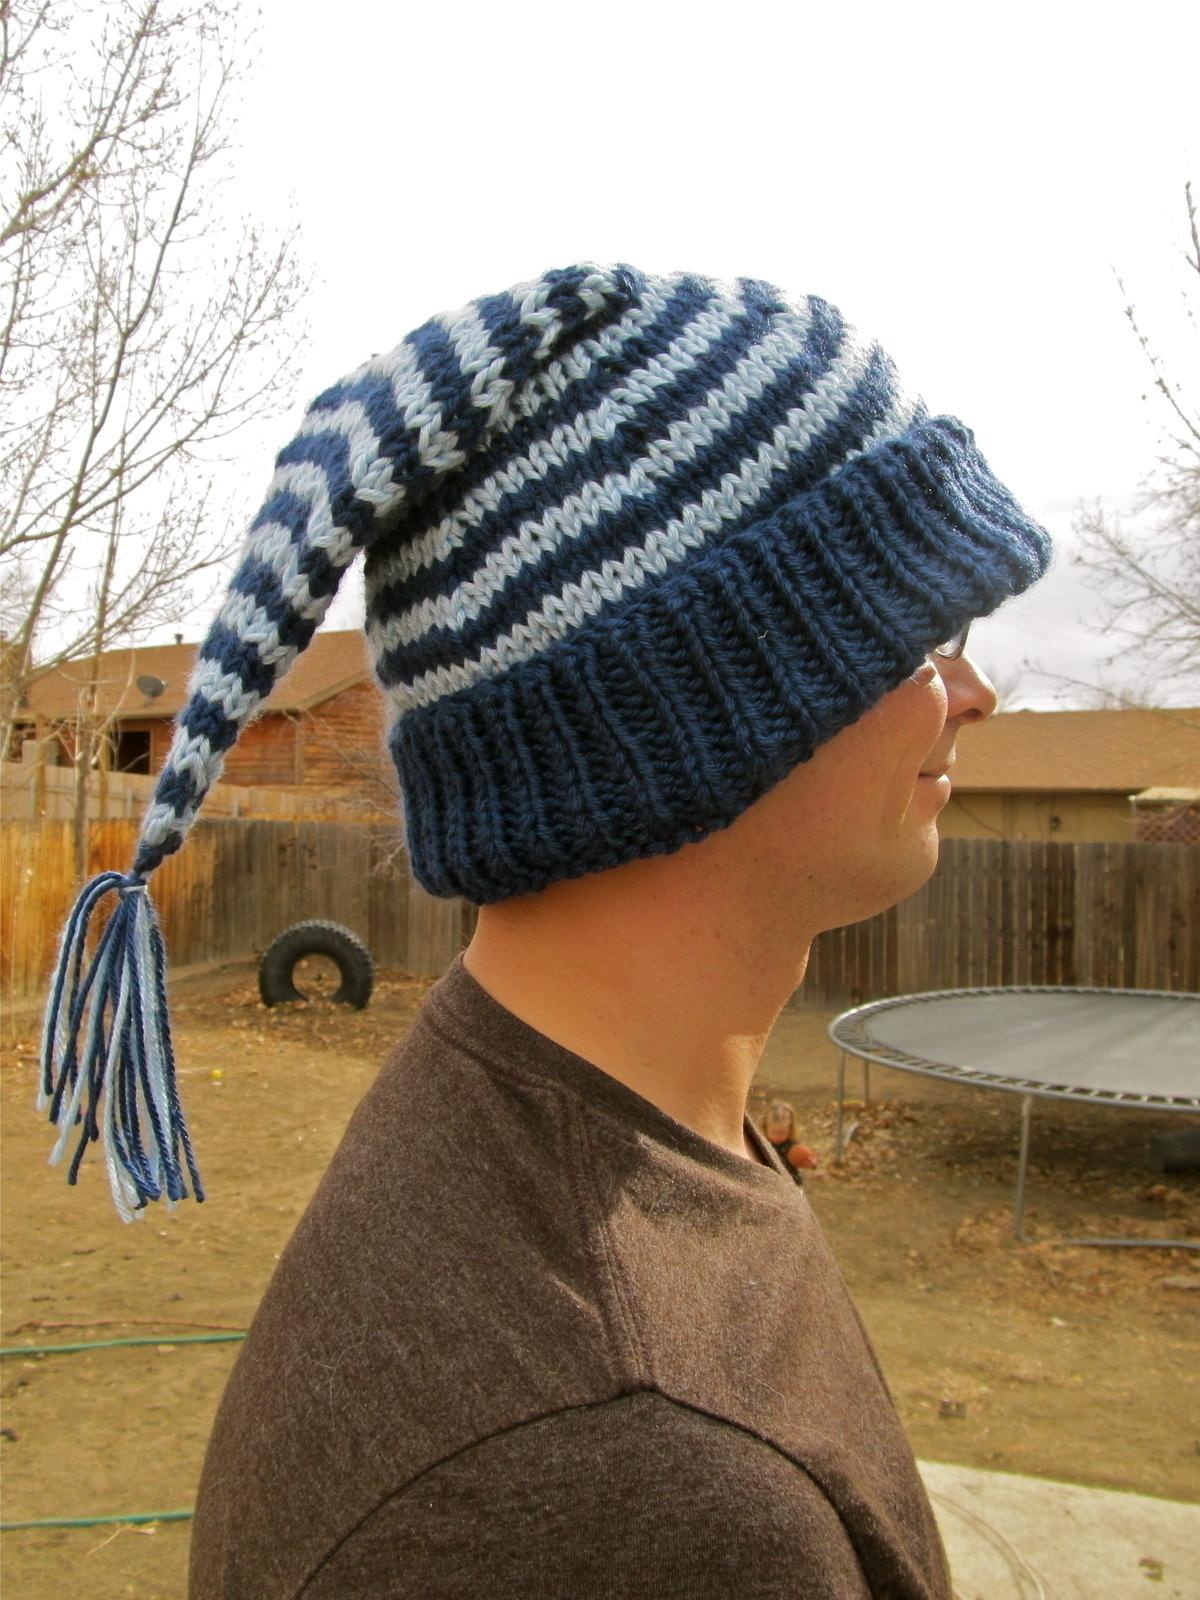 Striped Quot Sleeping Cap Quot Winter Hat 183 A Novelty Hat